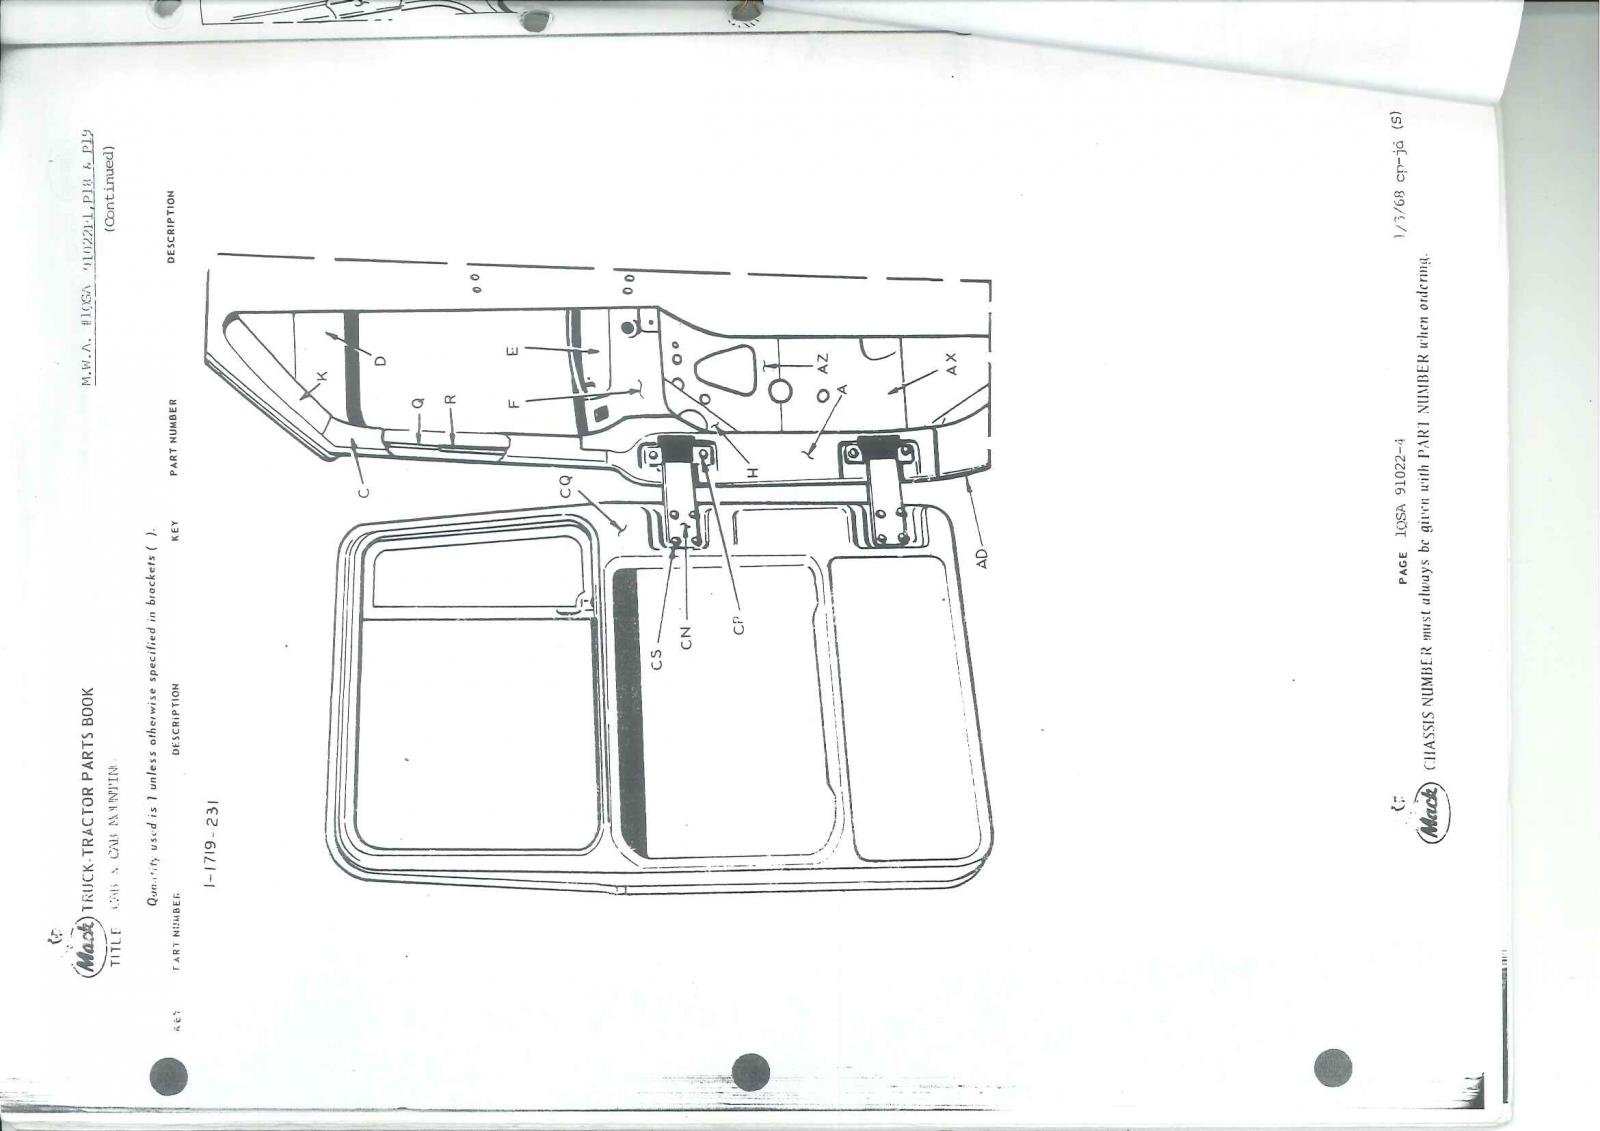 Mack Rw700 Superliner | Wiring Diagram Database on mack chn613, mack cl series, mack dm690, mack mr688s, mack ct713, mack ch612, mack rd series, mack vision, mack cx613, mack dump trucks, mack rd690s, mack ch613,